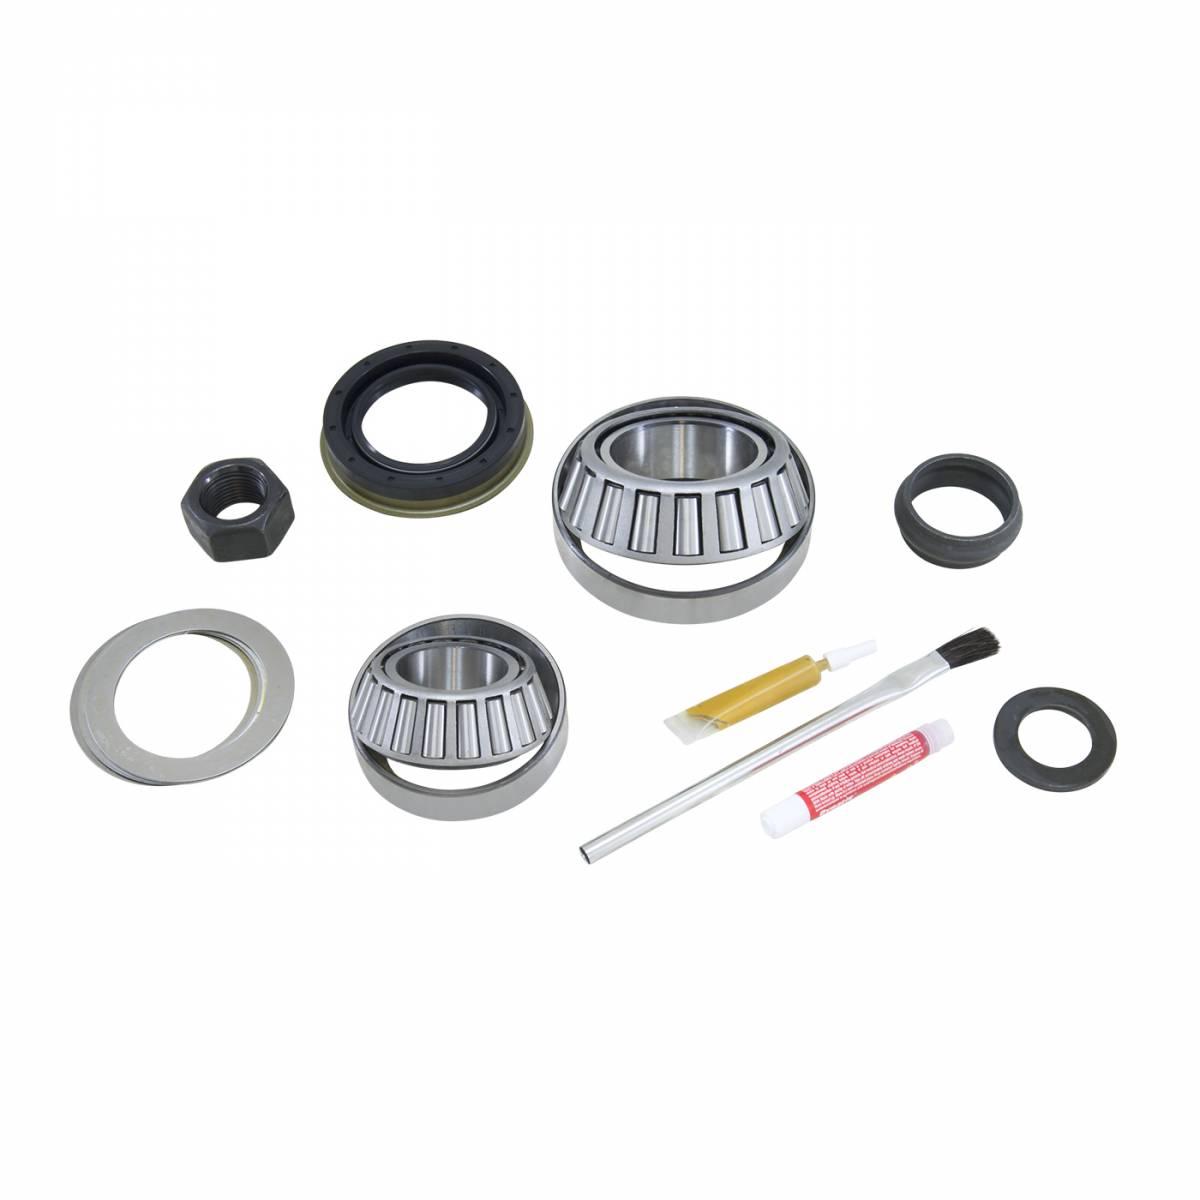 Yukon Gear #PK C9 25-R Pinion Install Kit - Atlantic-Speed com